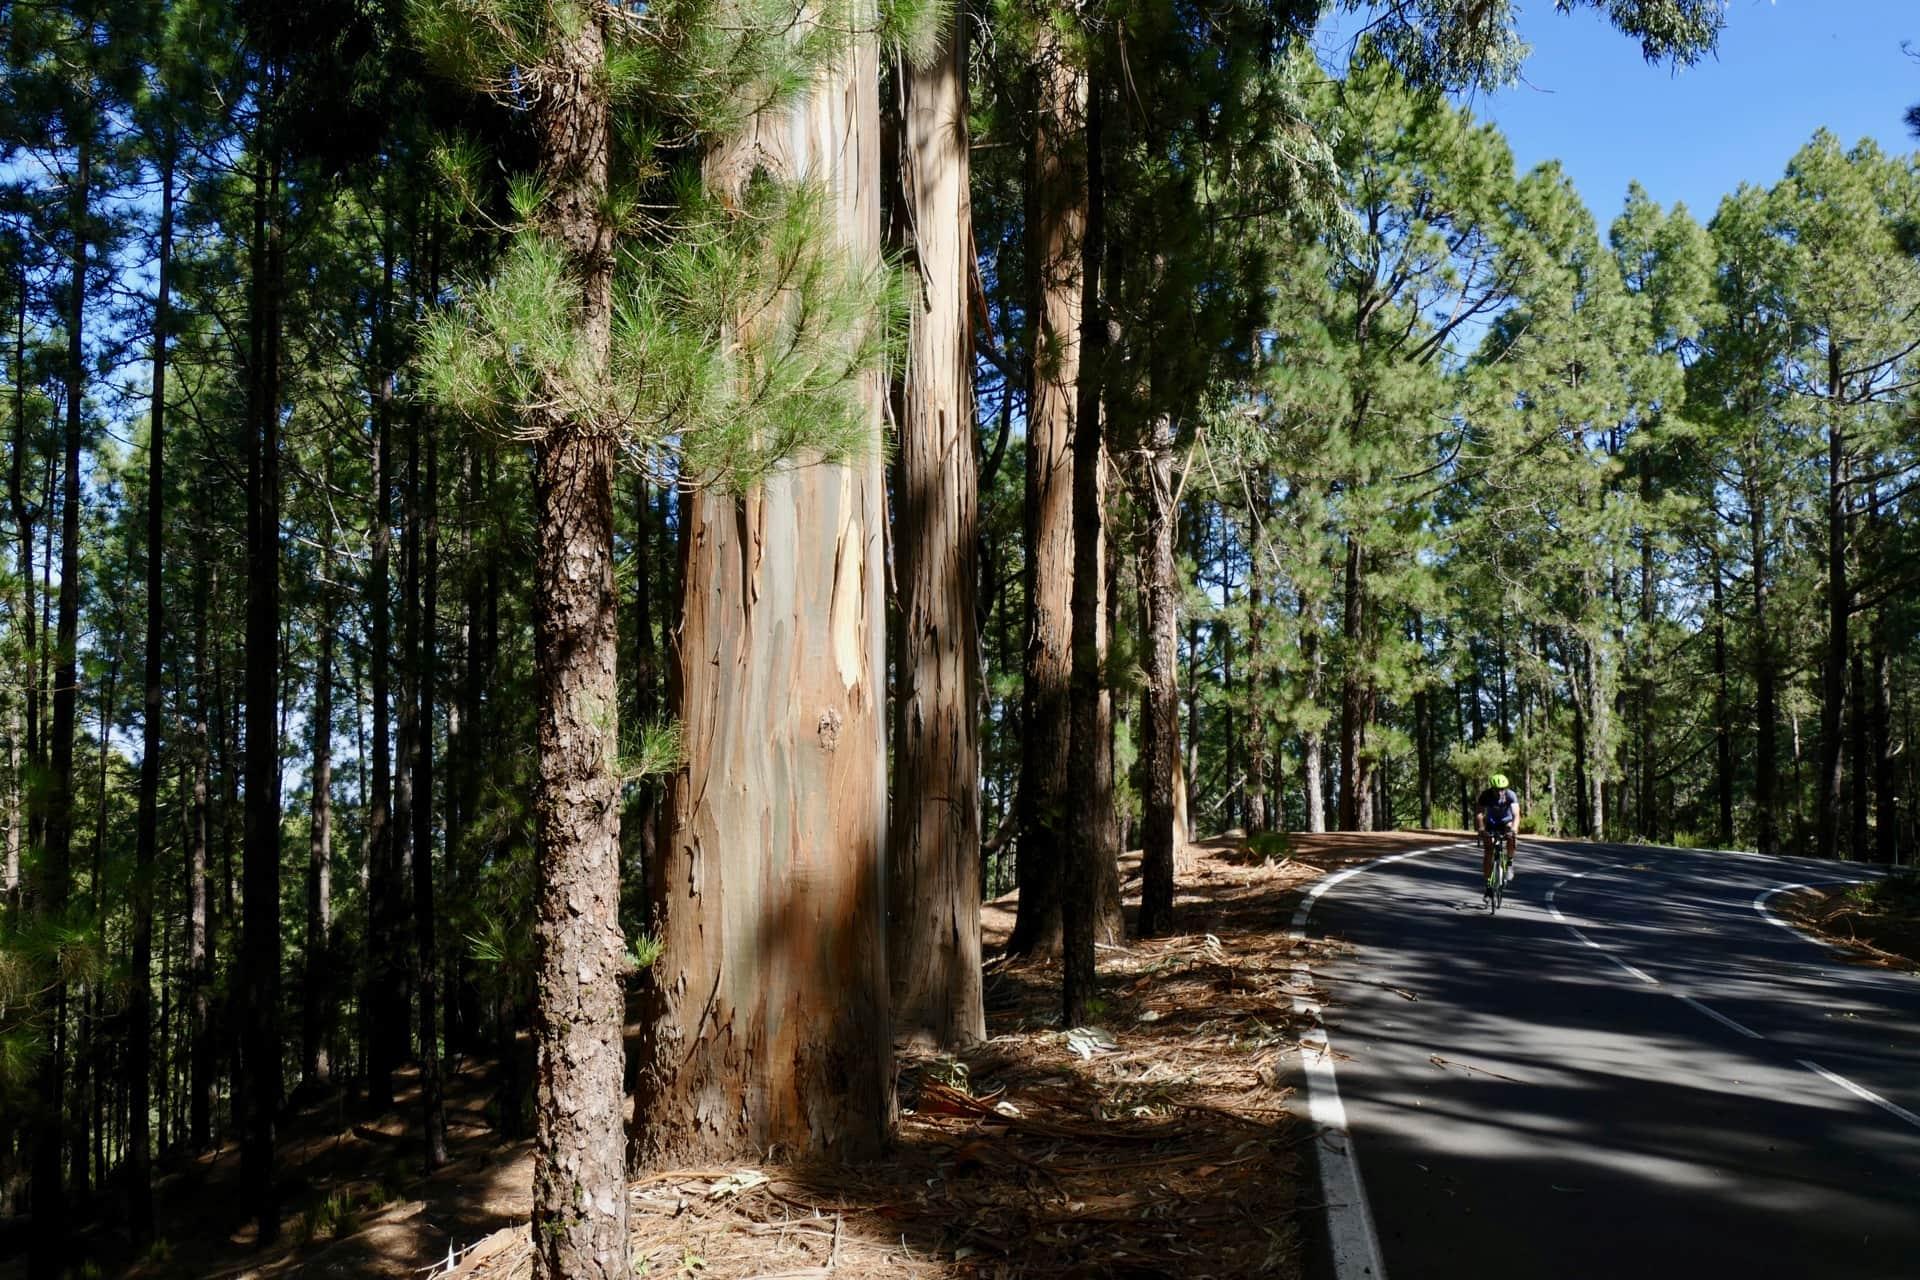 Teide National Park roads